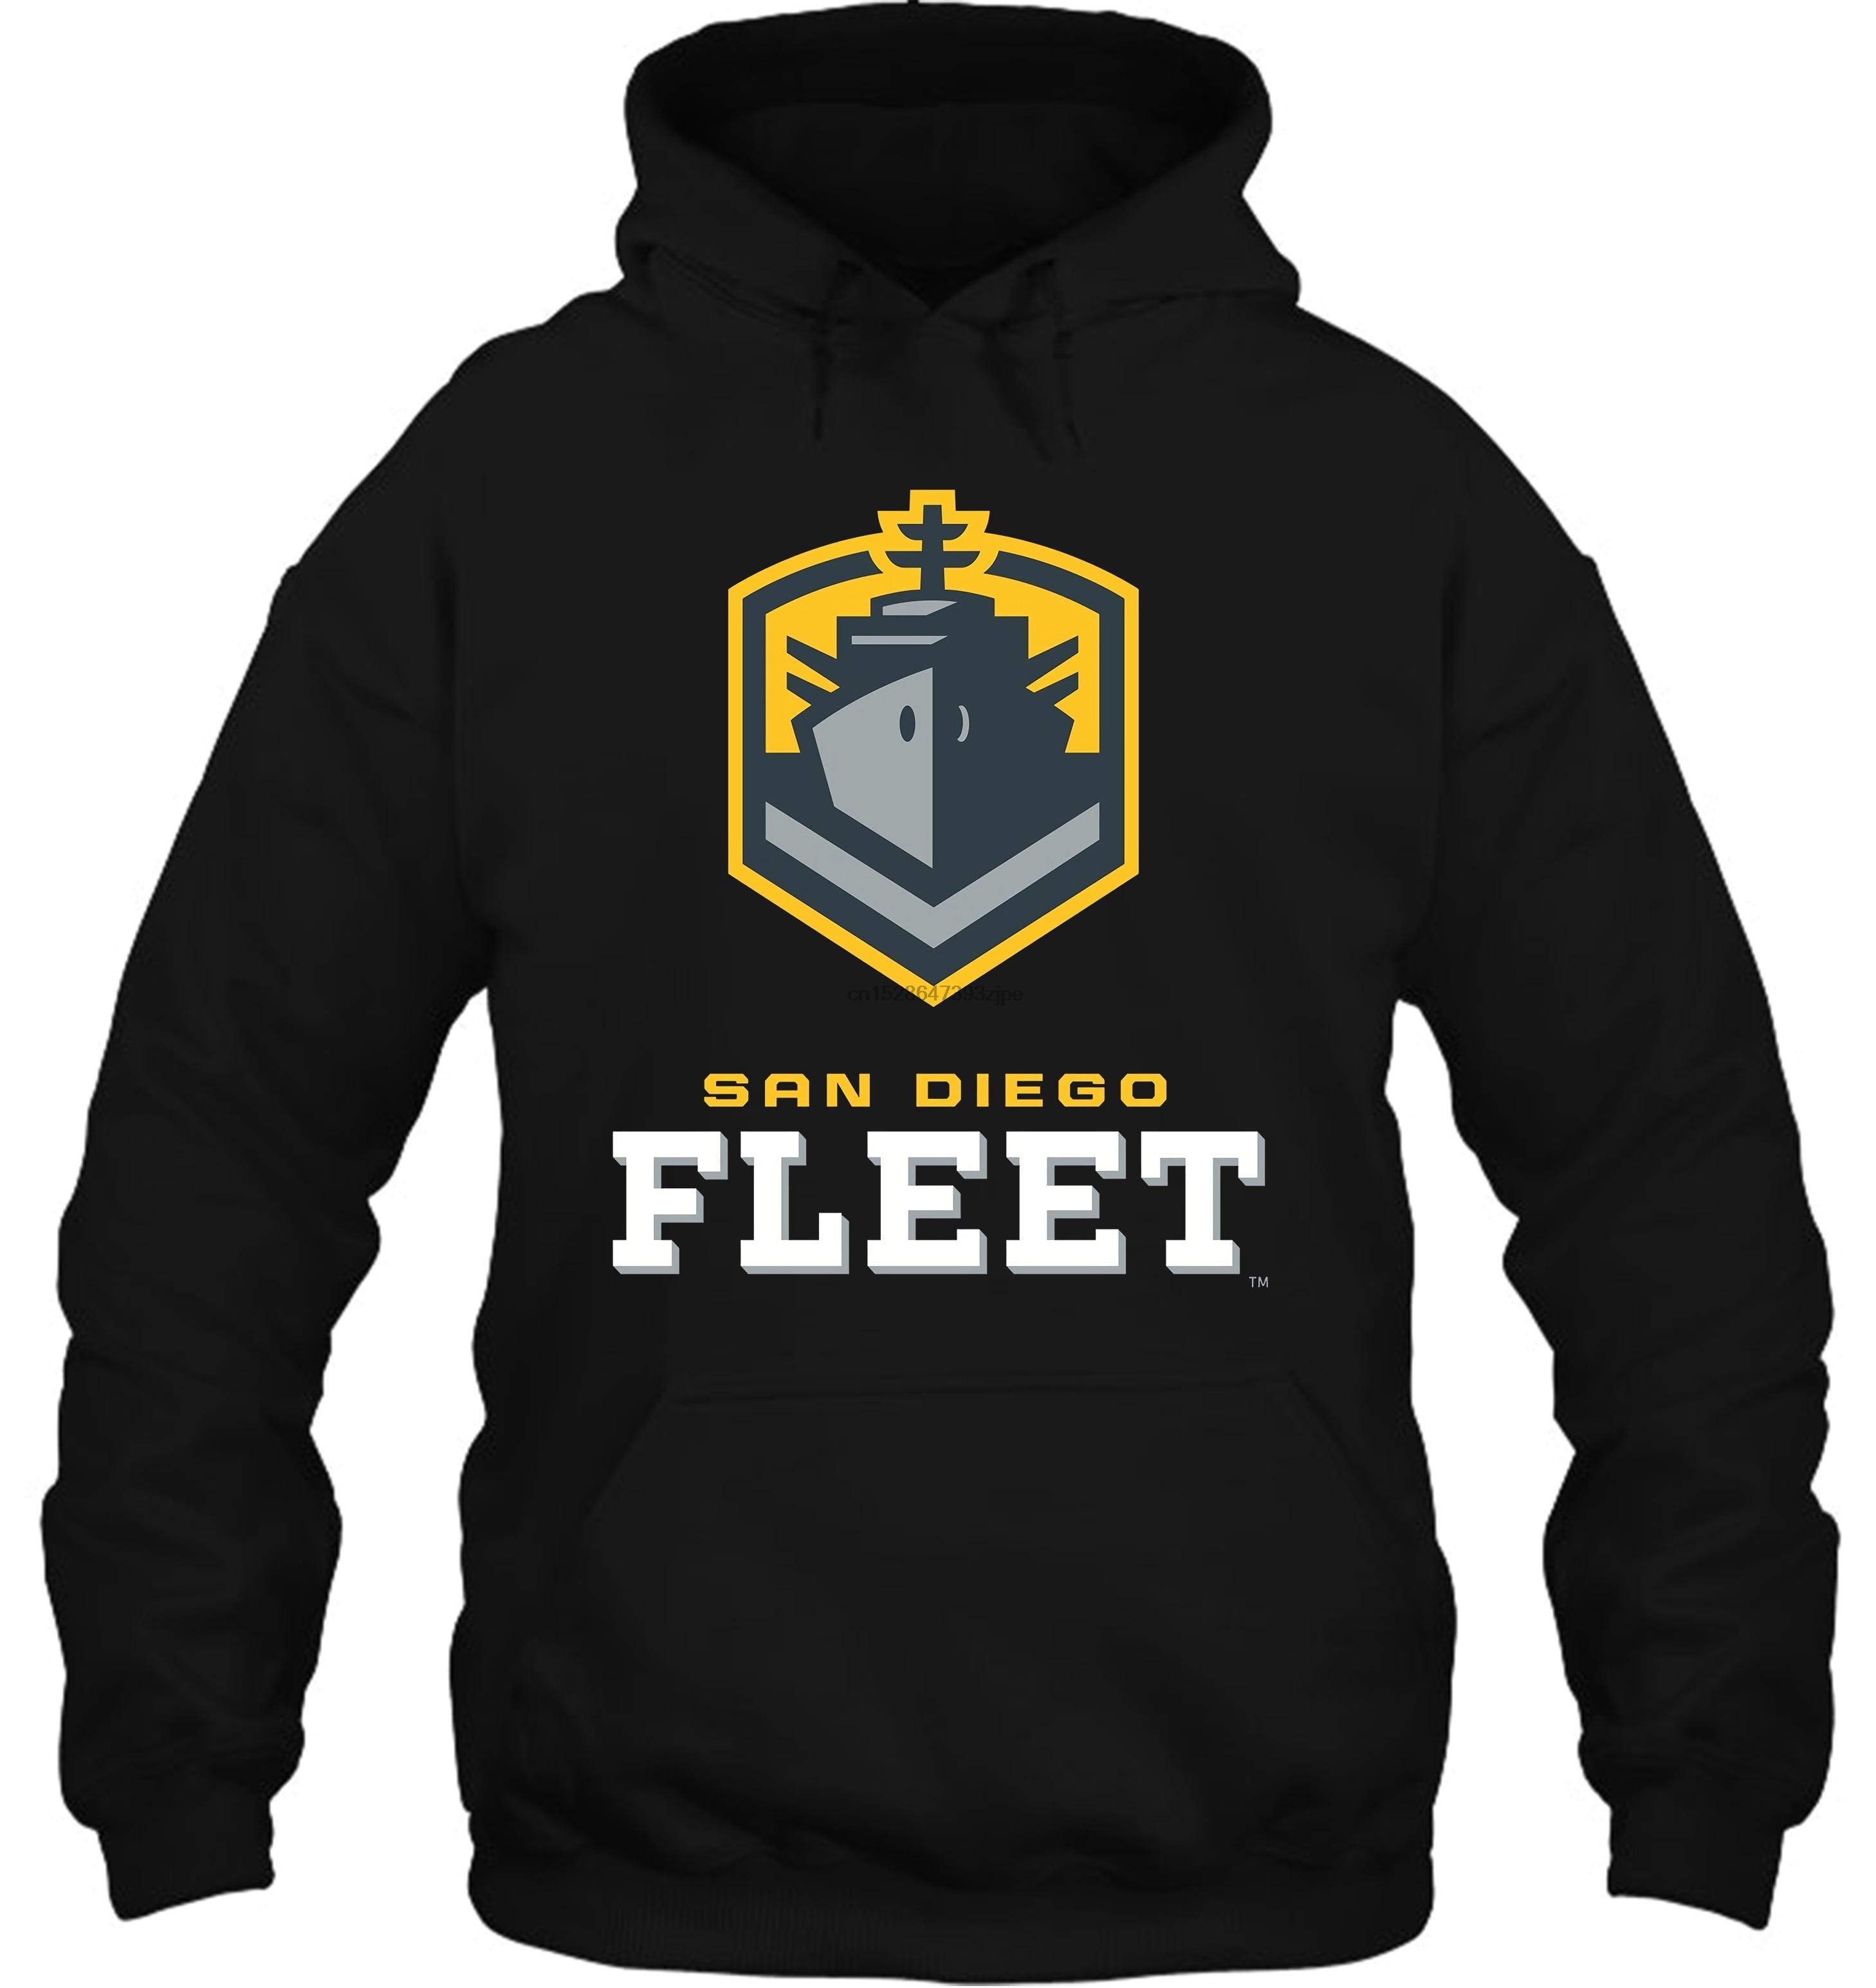 San Diego Fleet US Alliance Football Team Logo Black S 6XL Streetwear Men Women Hoodies Sweatshirts